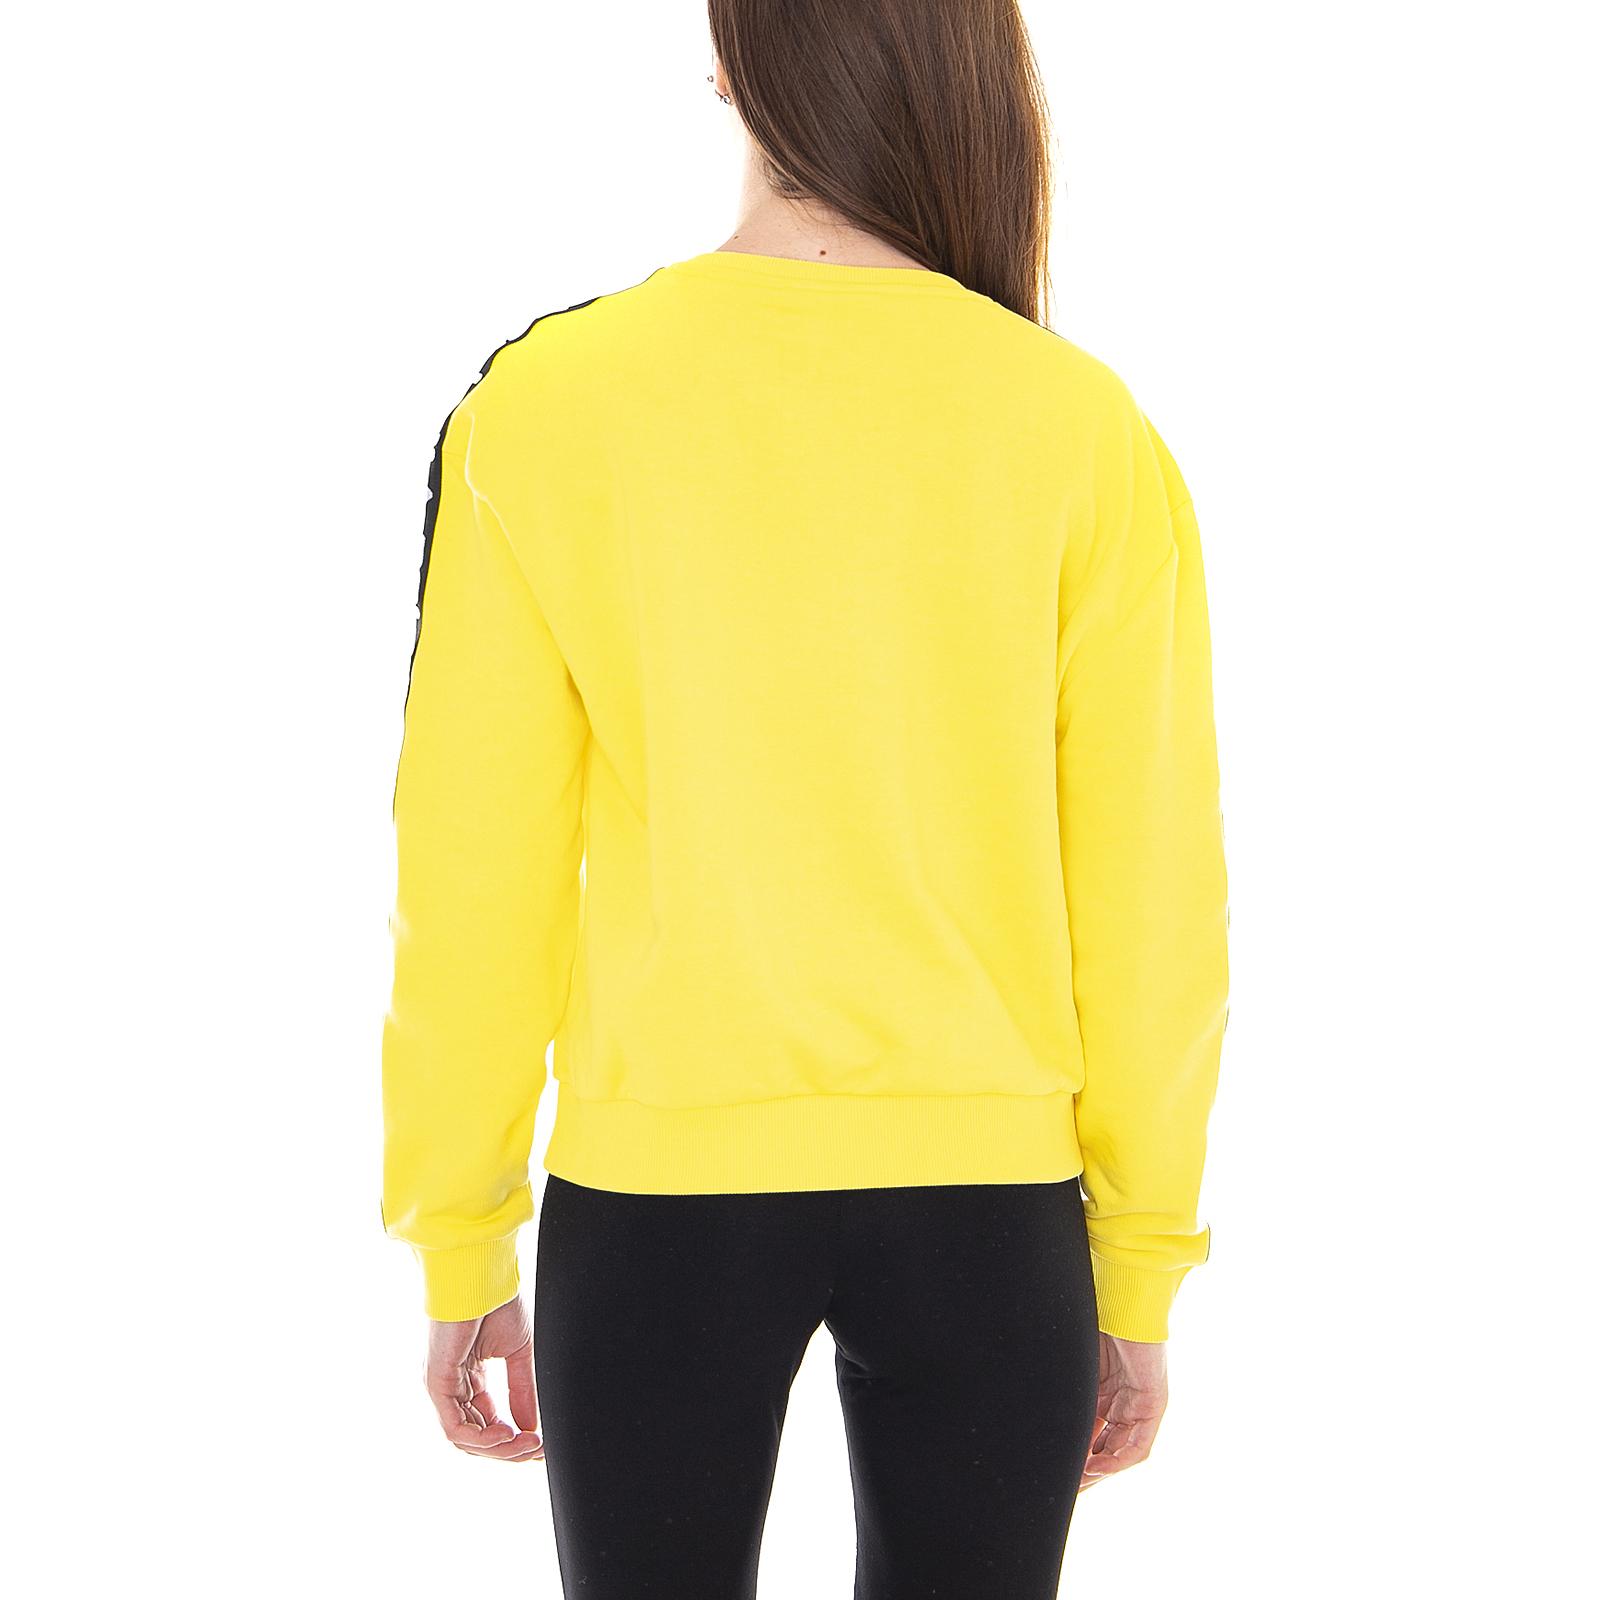 Tivka Sweat Fila Sweatshirts Vibrant Crew Women Ebay Yellow PrqTFIqExw